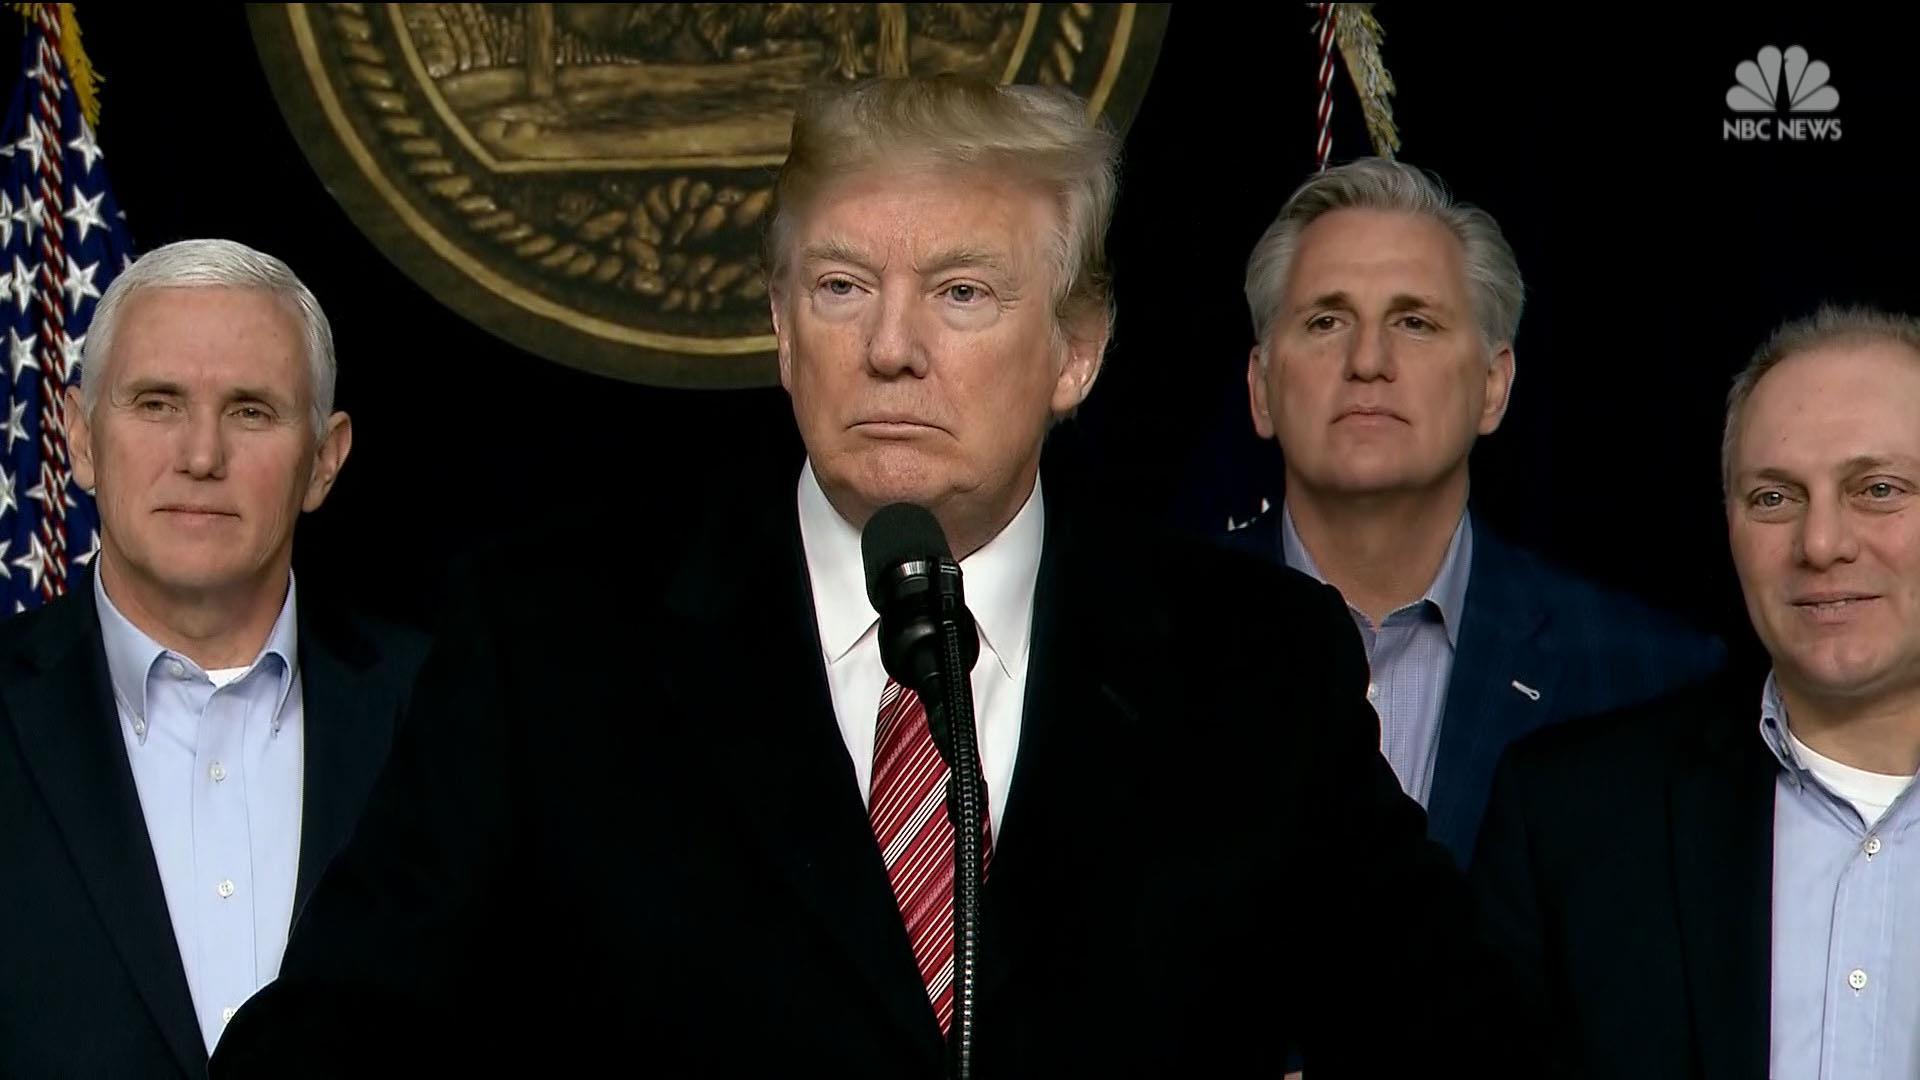 Trump says he's open to talking to North Korea's Kim Jong Un